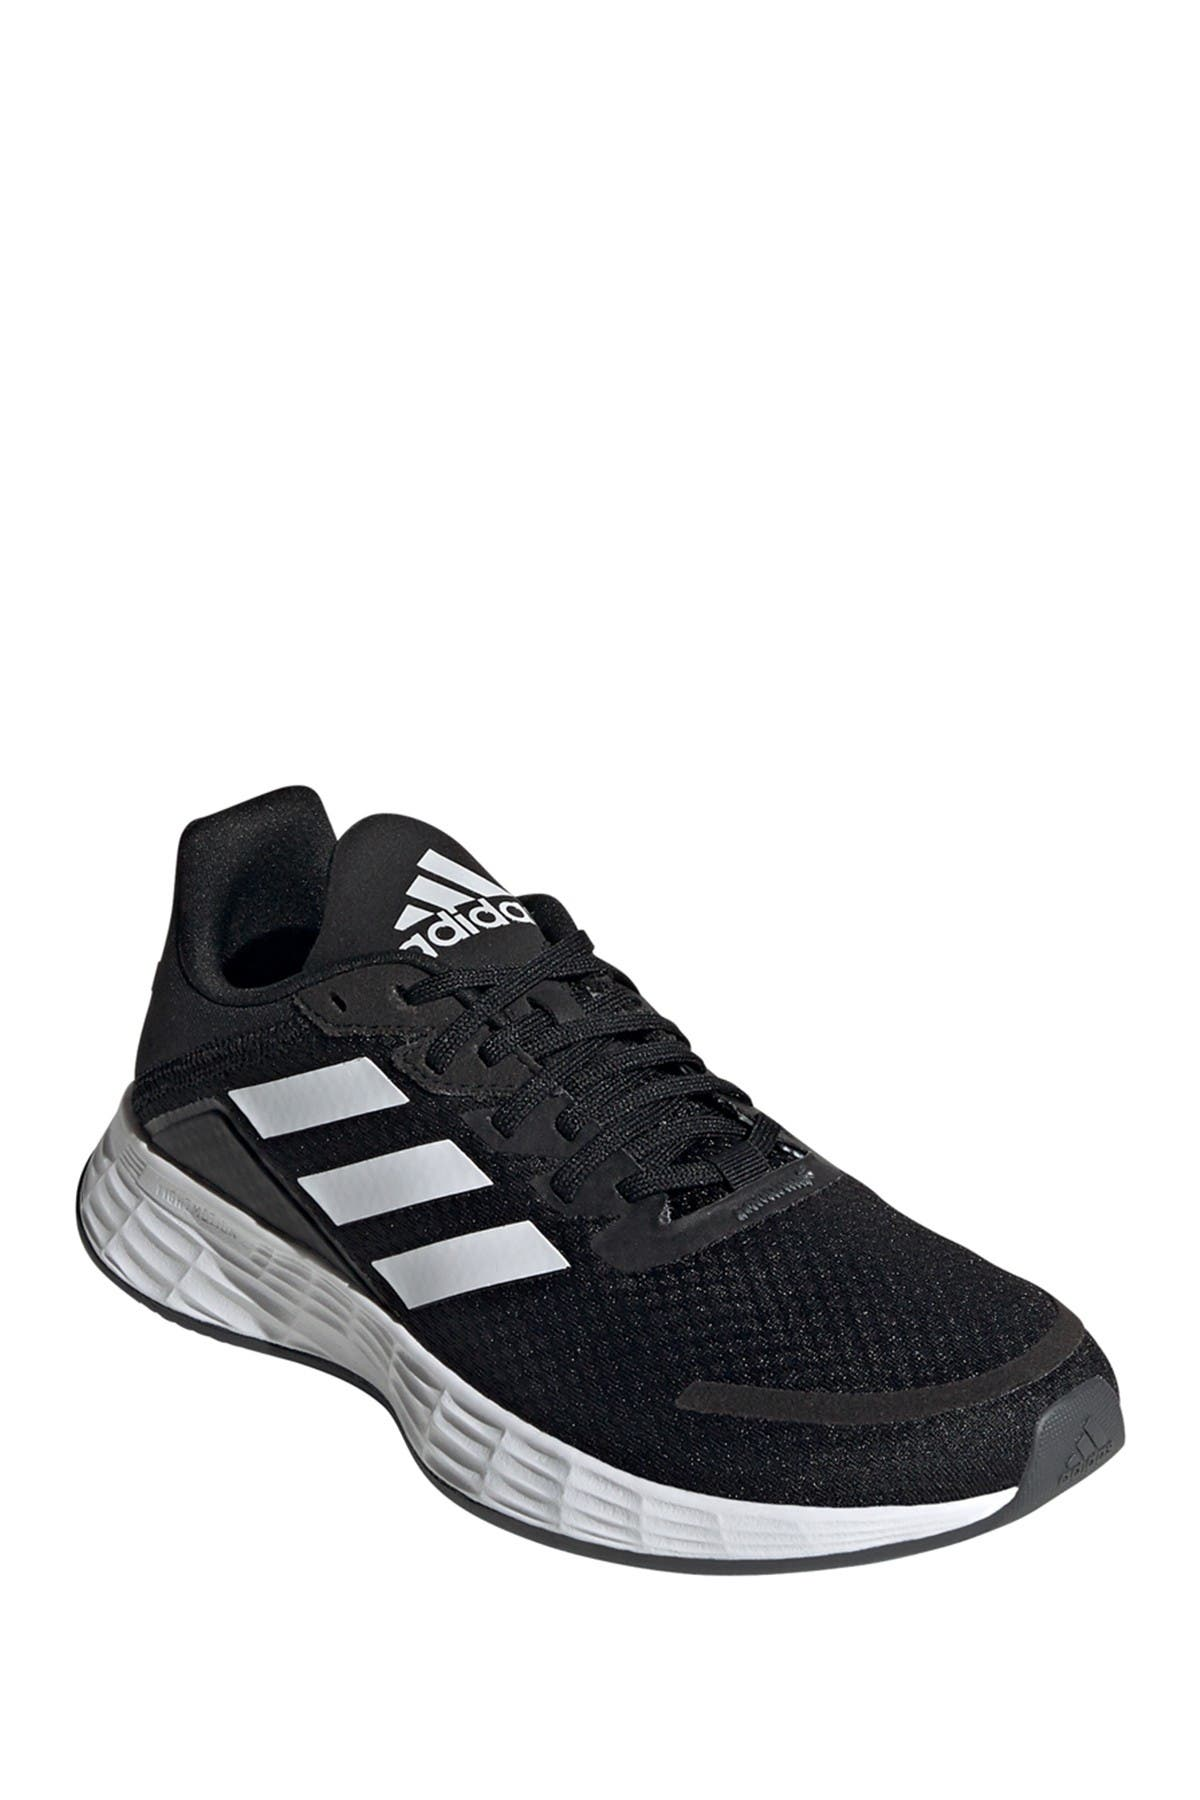 Image of adidas Duramo SL Sneaker